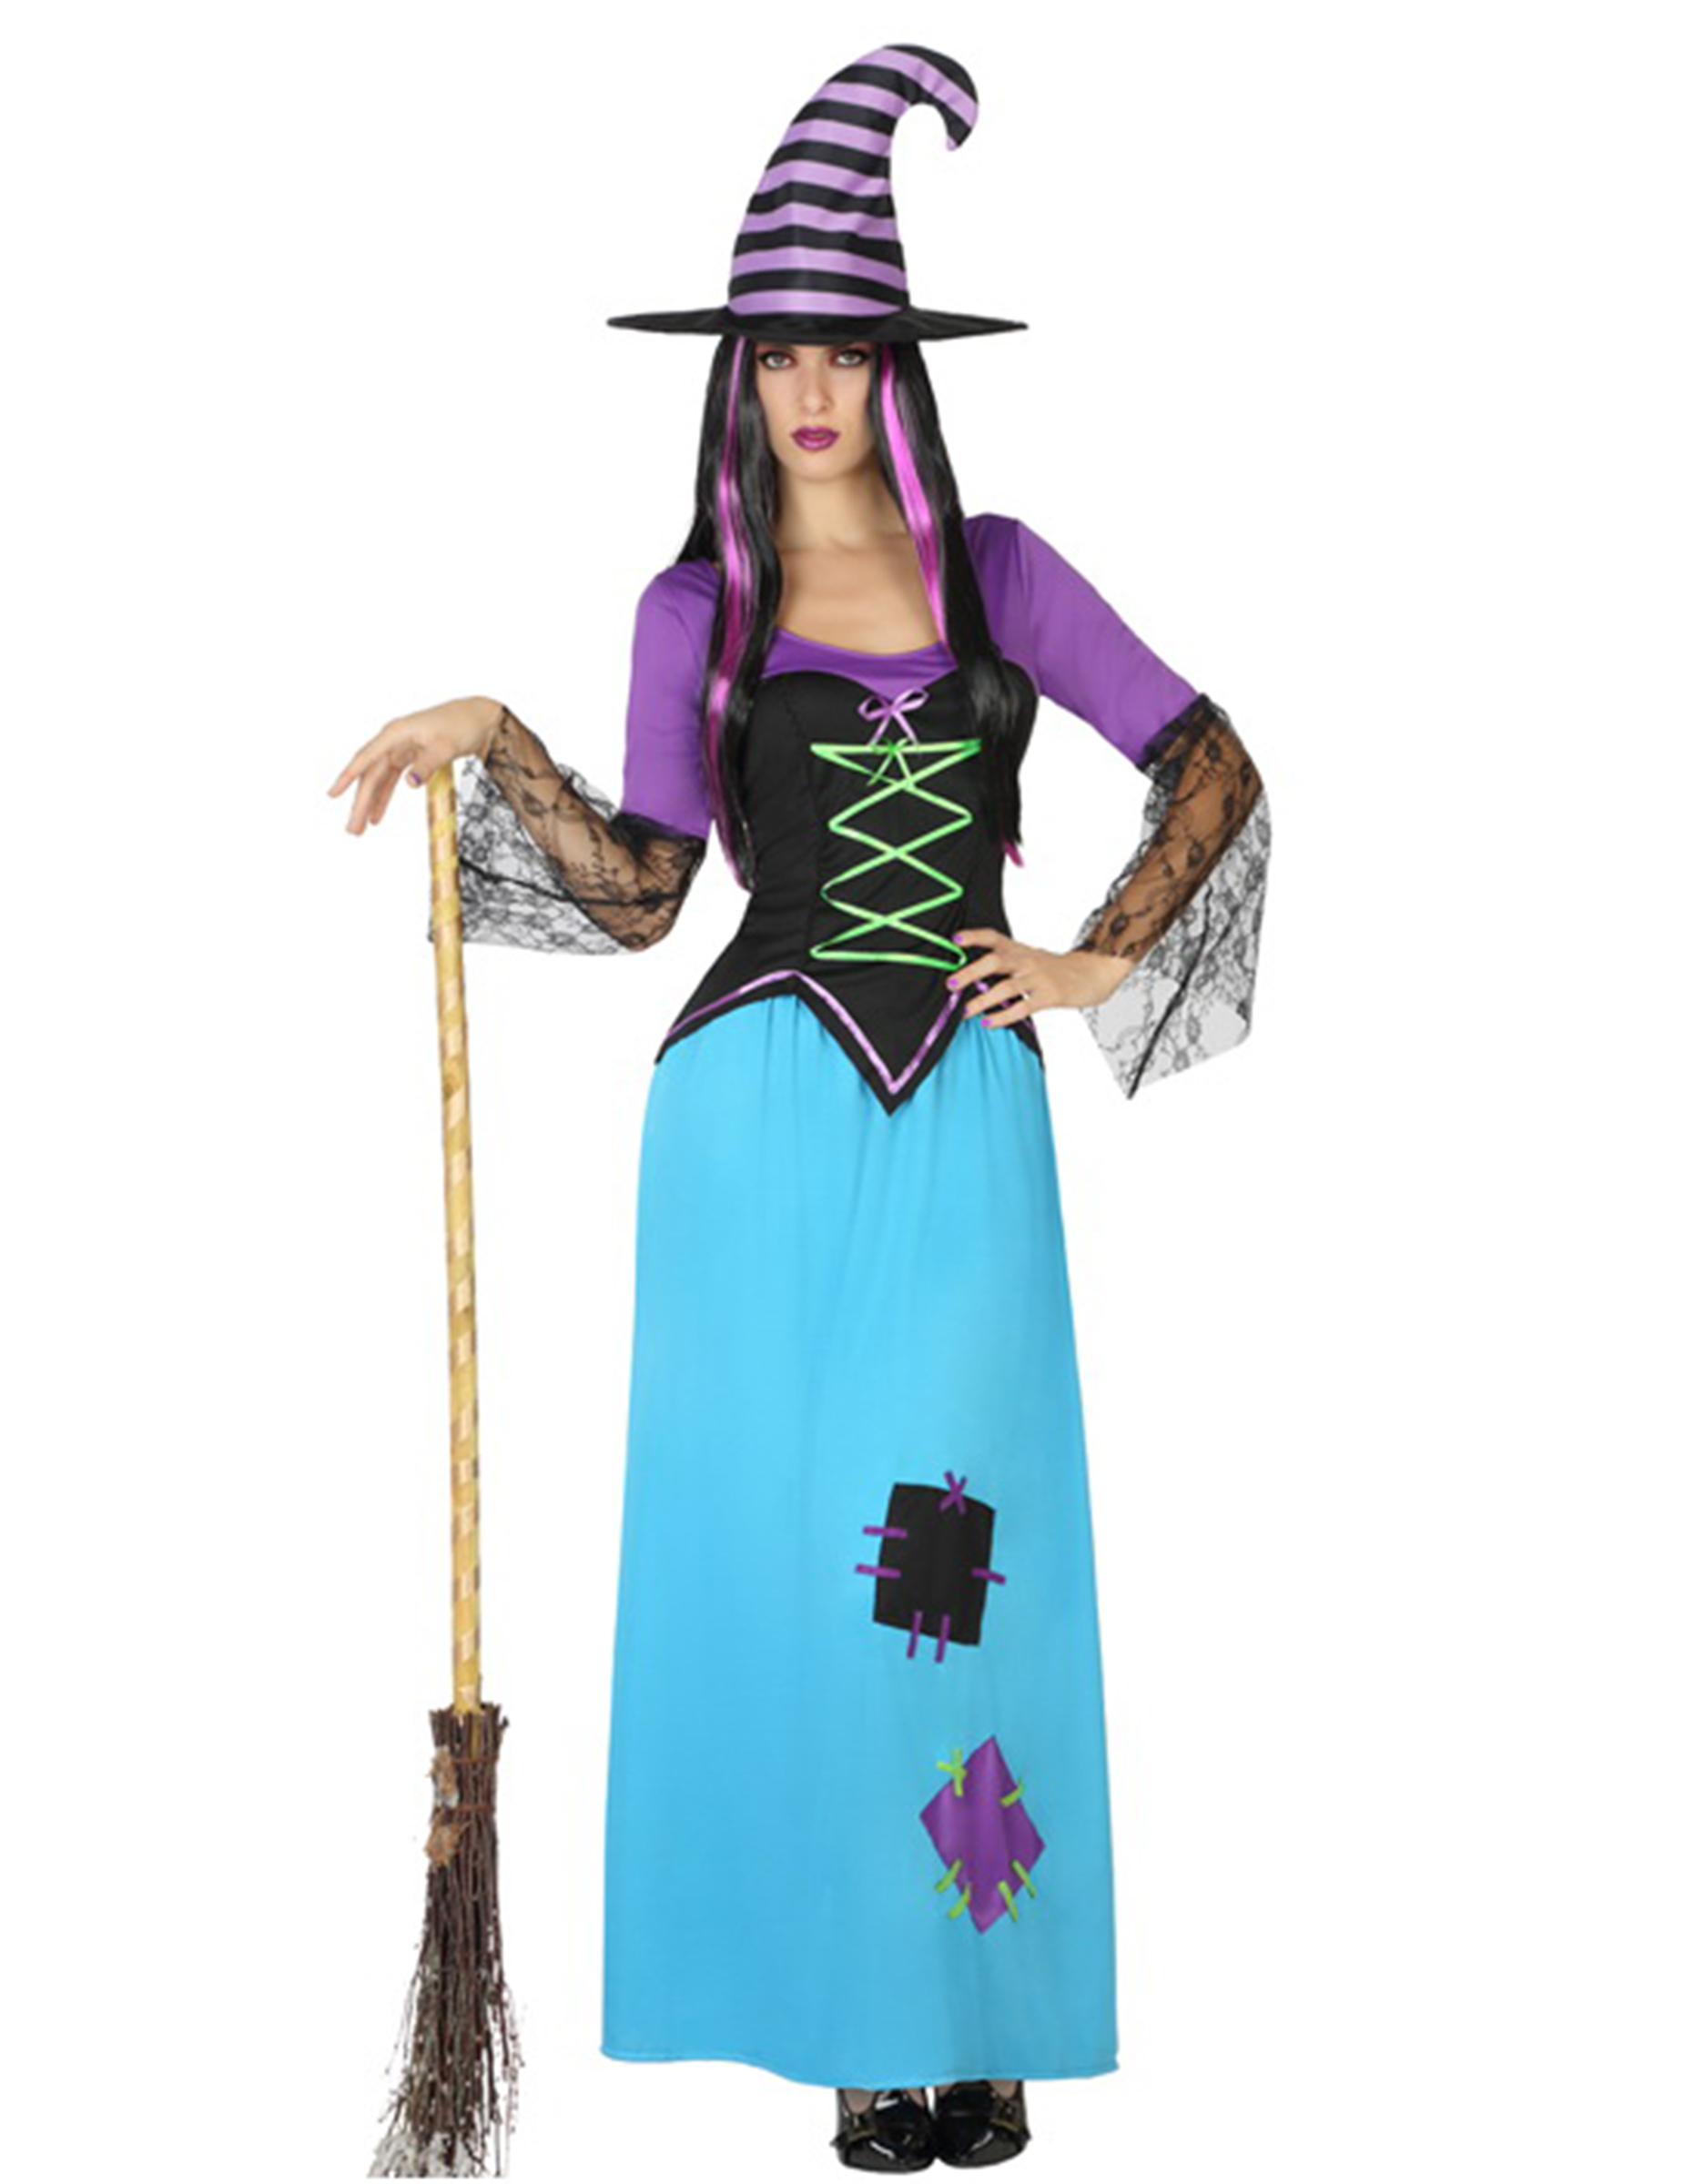 costume strega halloween costumi adulti e vestiti di carnevale online vegaoo. Black Bedroom Furniture Sets. Home Design Ideas